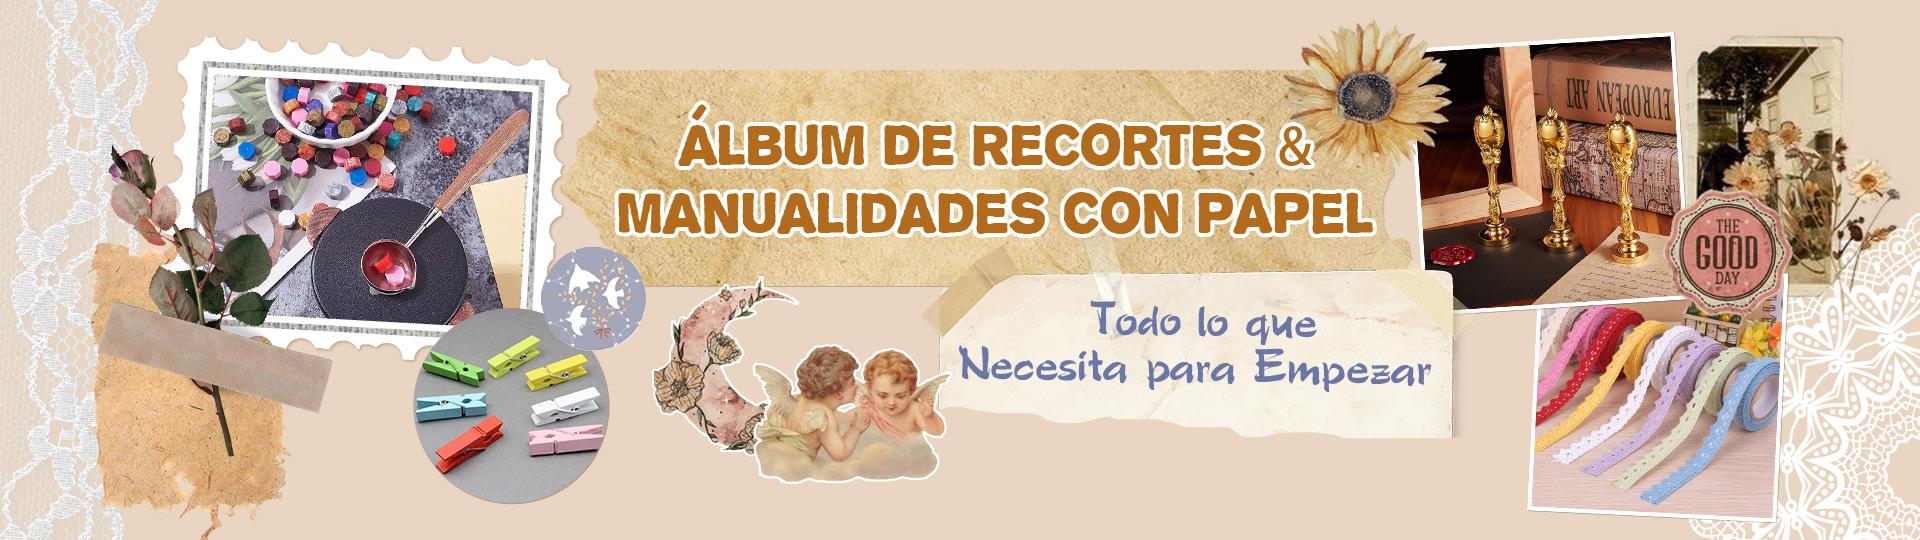 Álbum de Recortes & Manualidades con Papel